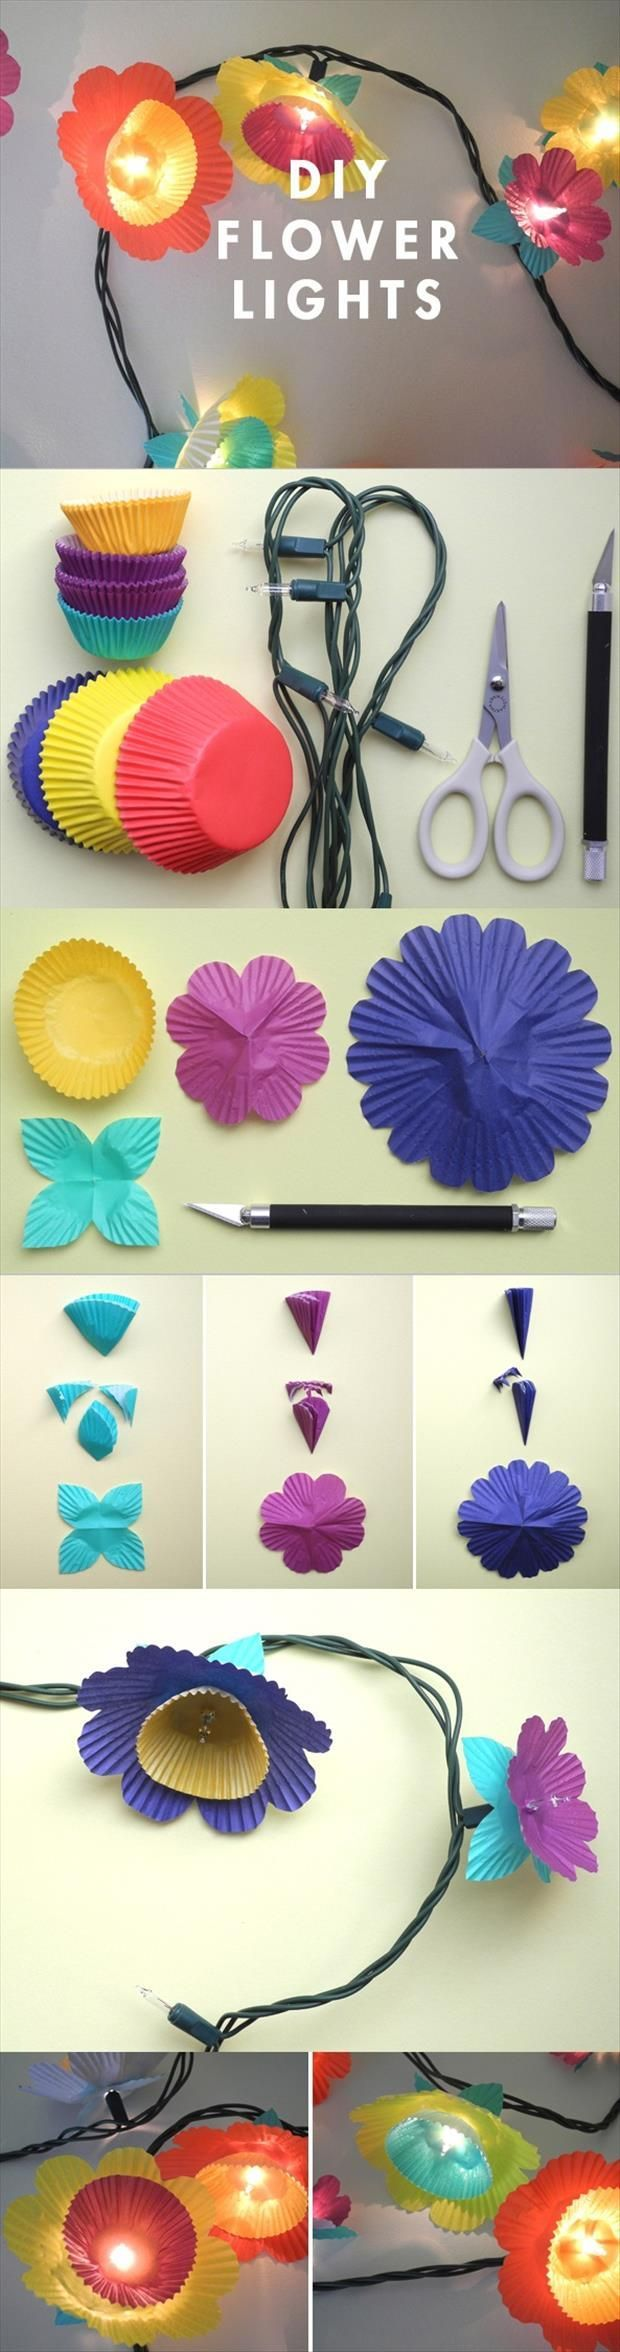 DIY flower lights       #DIY #craft #crafty